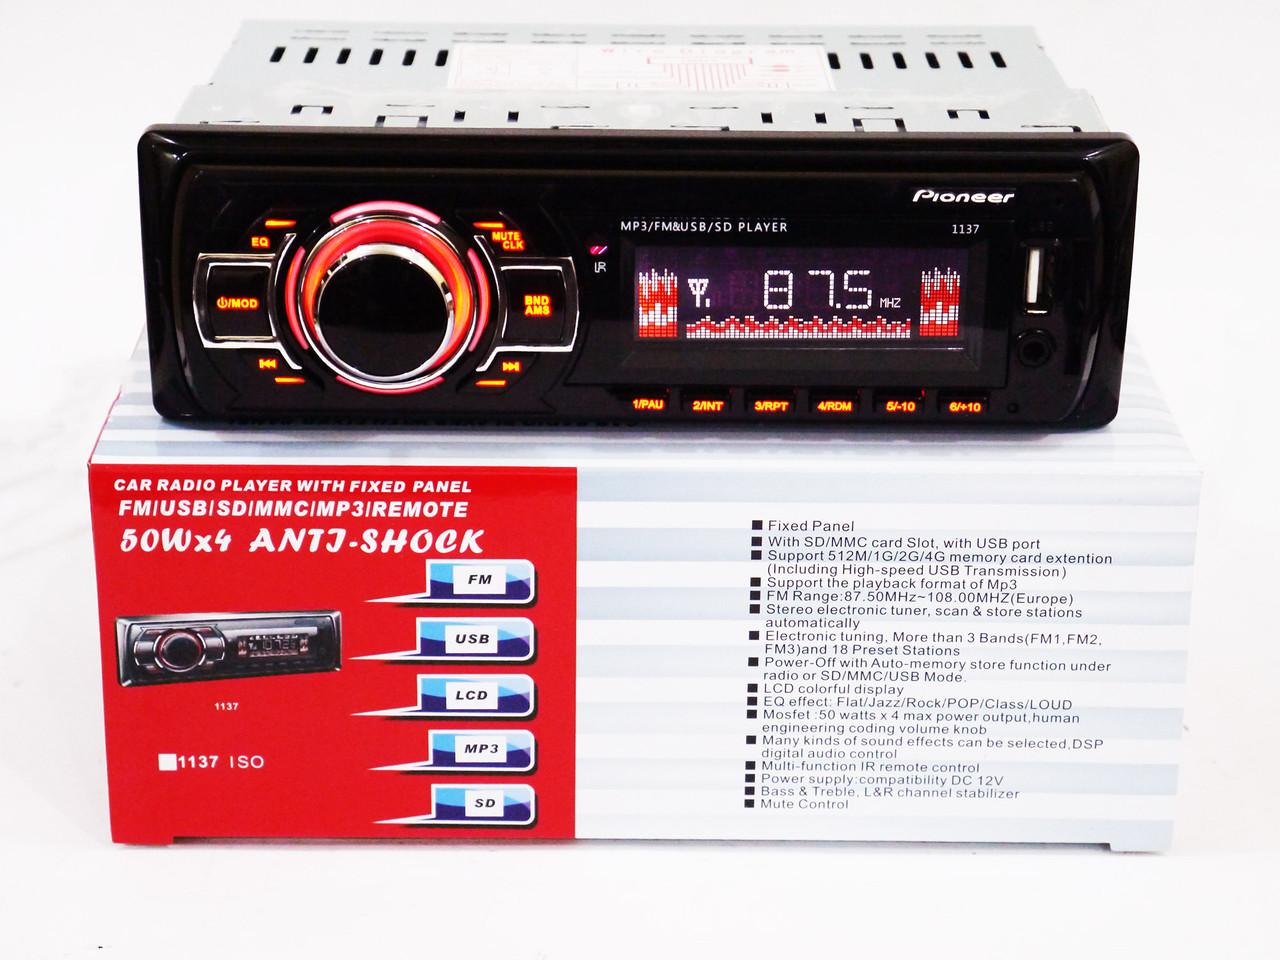 Автомагнитола Pioneer 1137 ISO Usb+Sd+Fm+Aux+ пульт (4x50W)